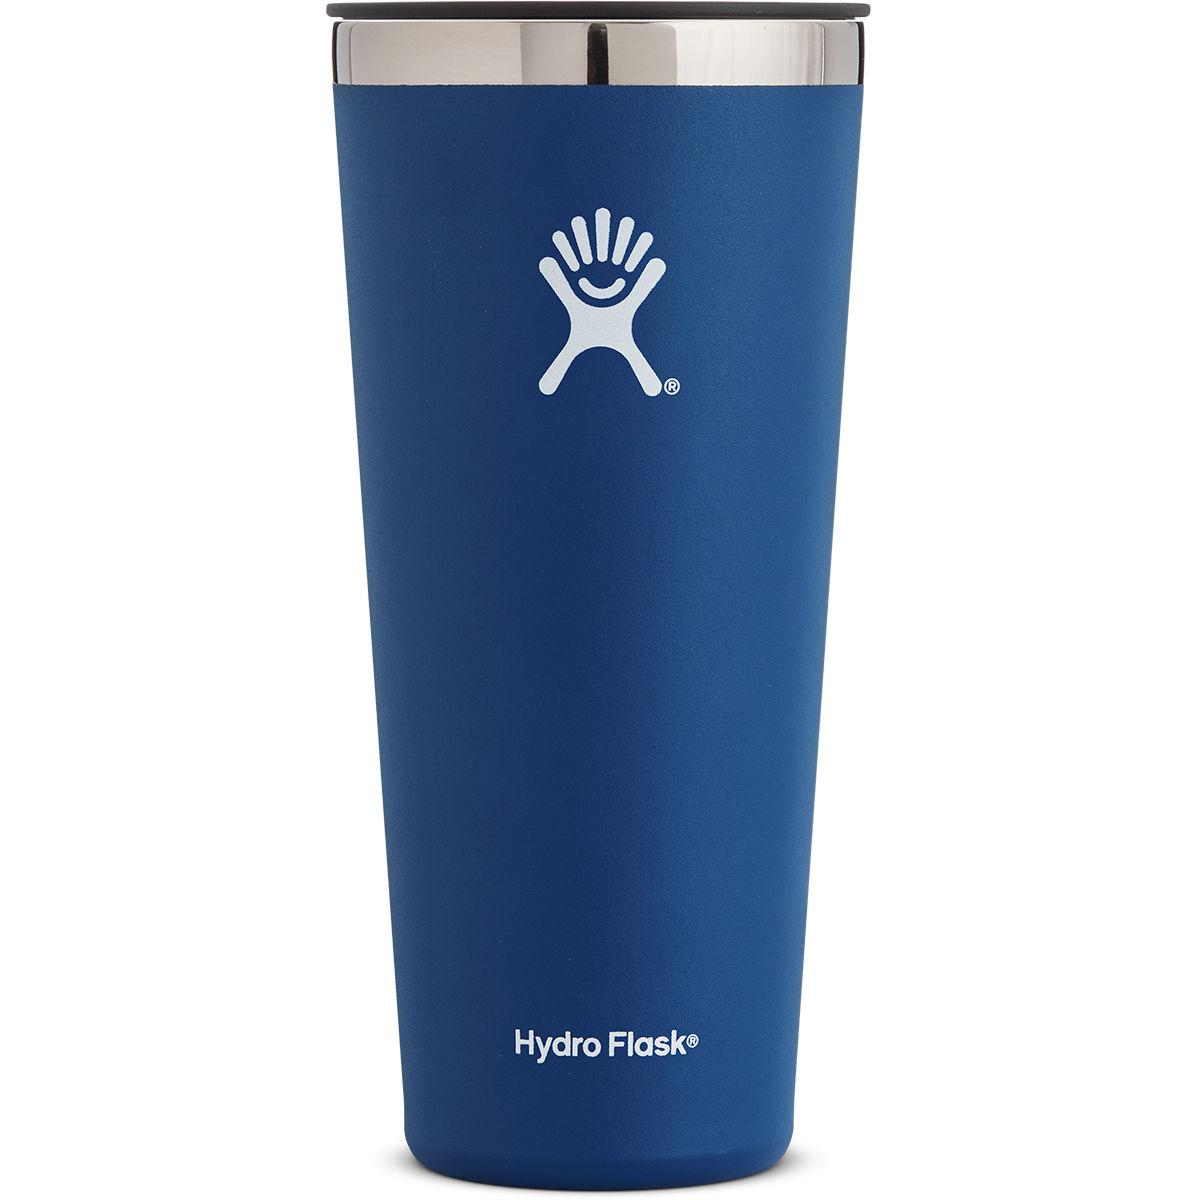 Hydro Flask 32 Oz. Tumbler